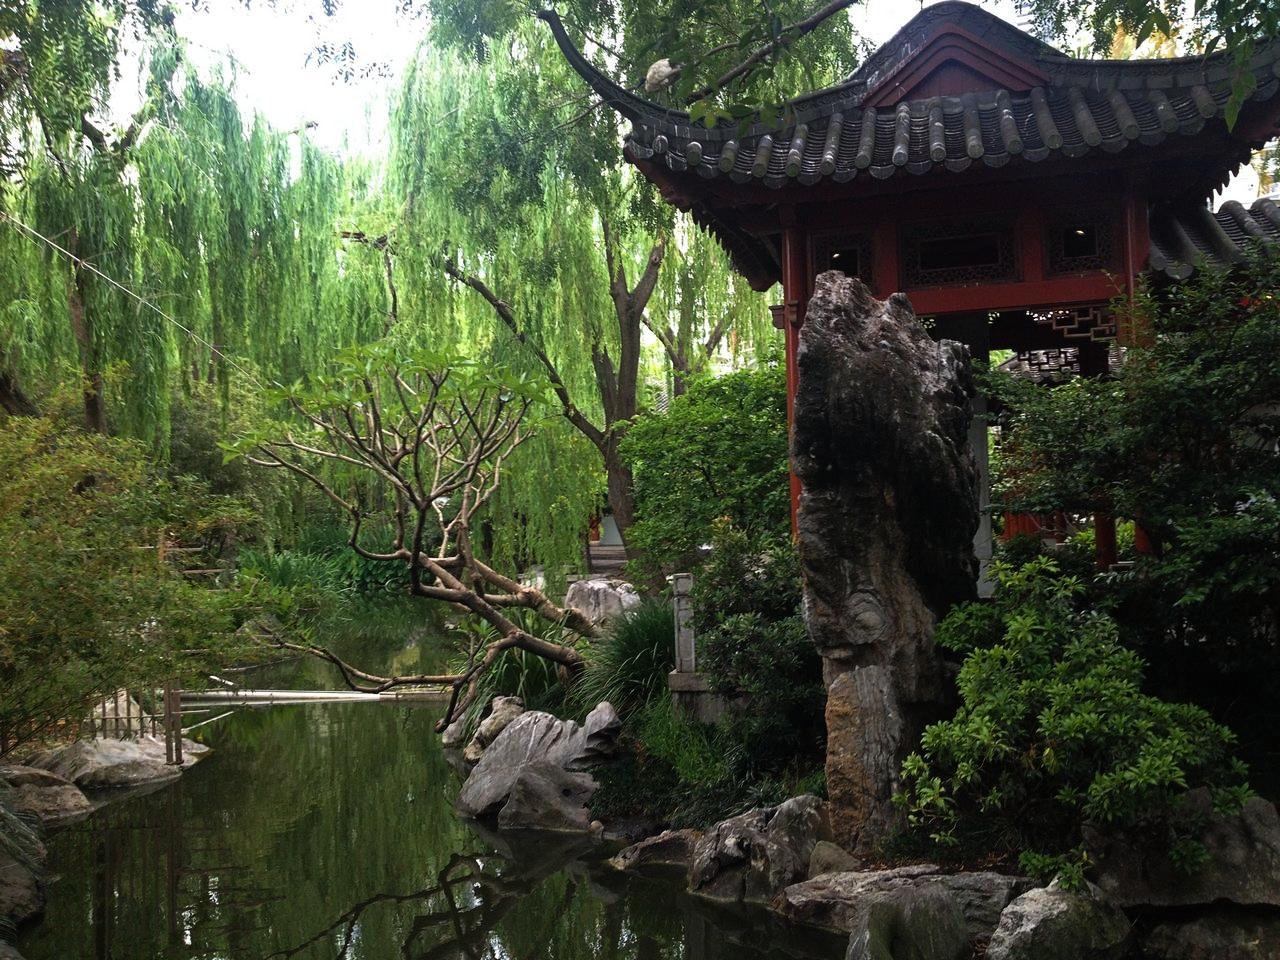 ¿Te apetece descansar y ver un paisaje oriental? Acércate a Chinatown.